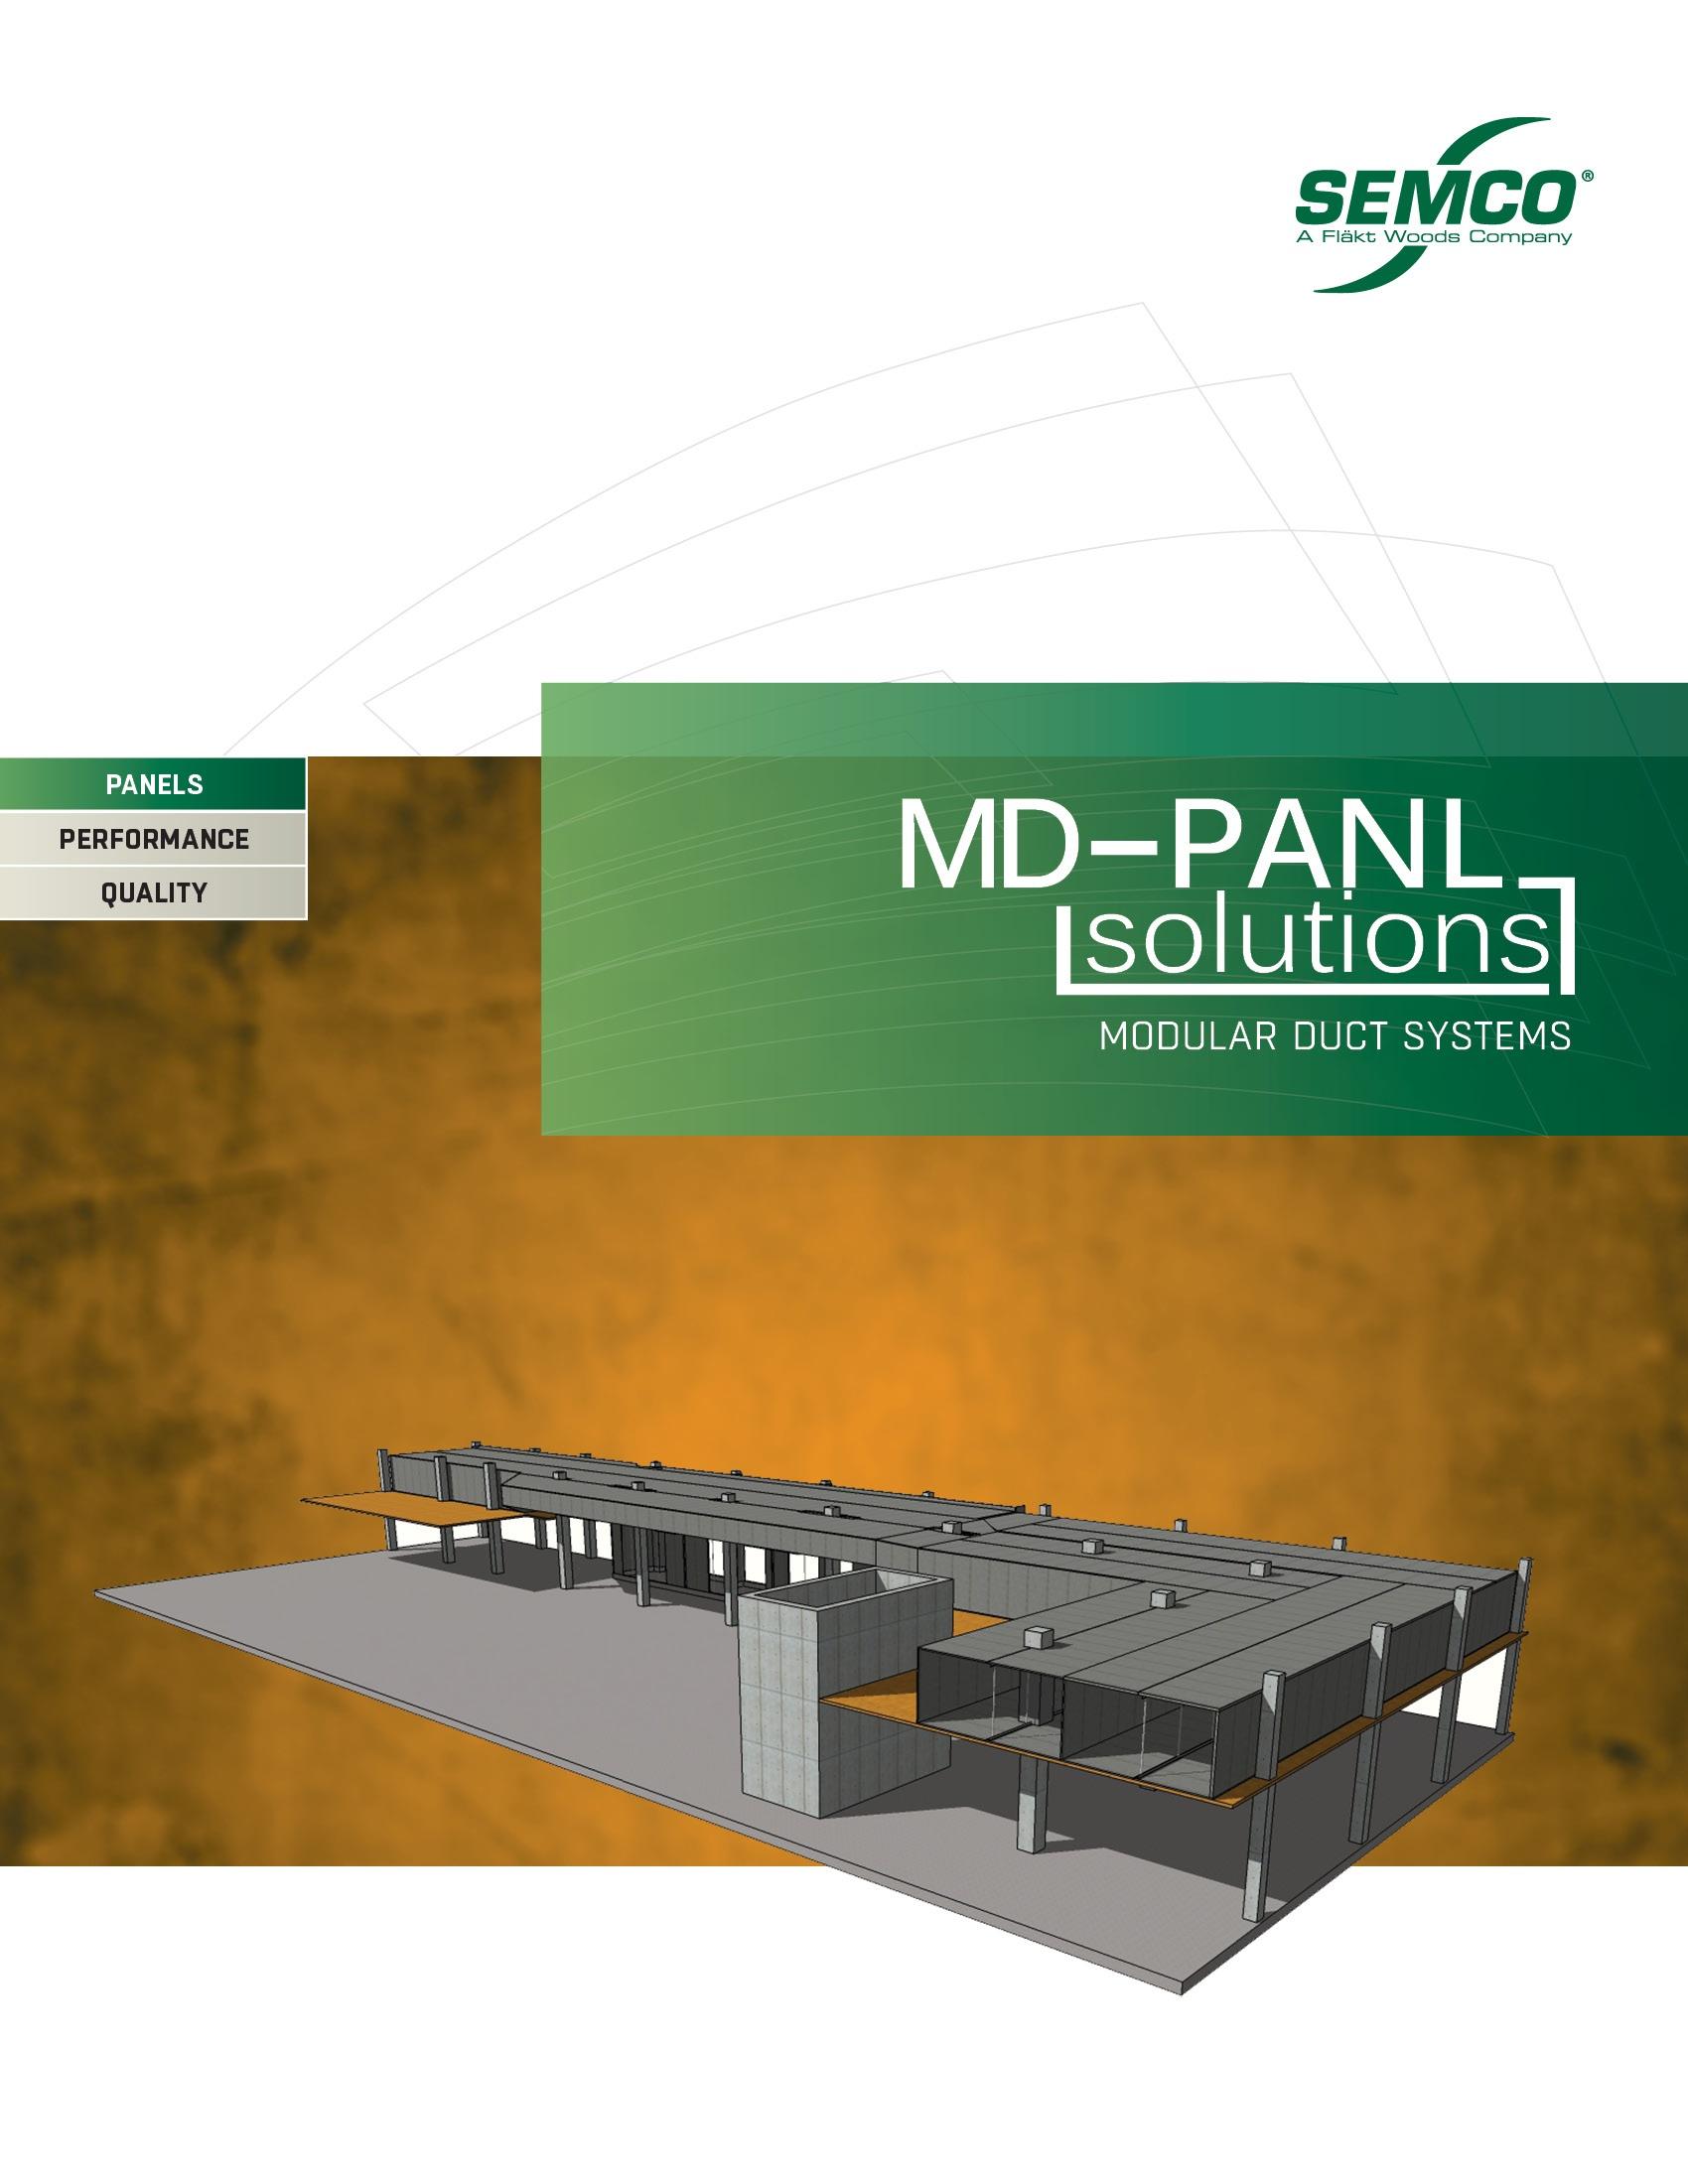 SEMCO_Modular_Panel_Duct_Systems_Brochure.jpg